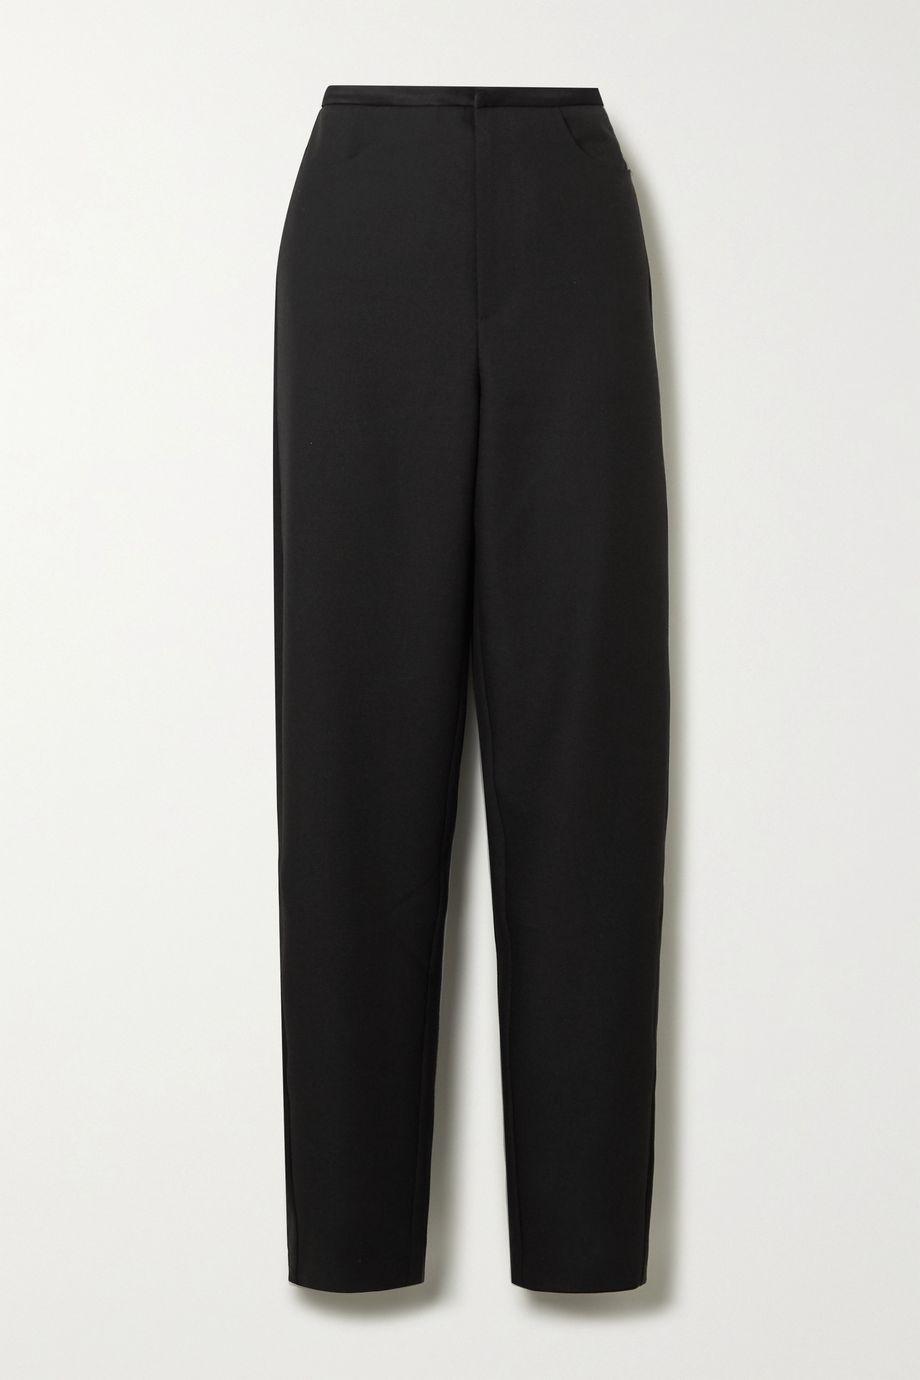 Totême Naves satin-trimmed piqué straight-leg pants